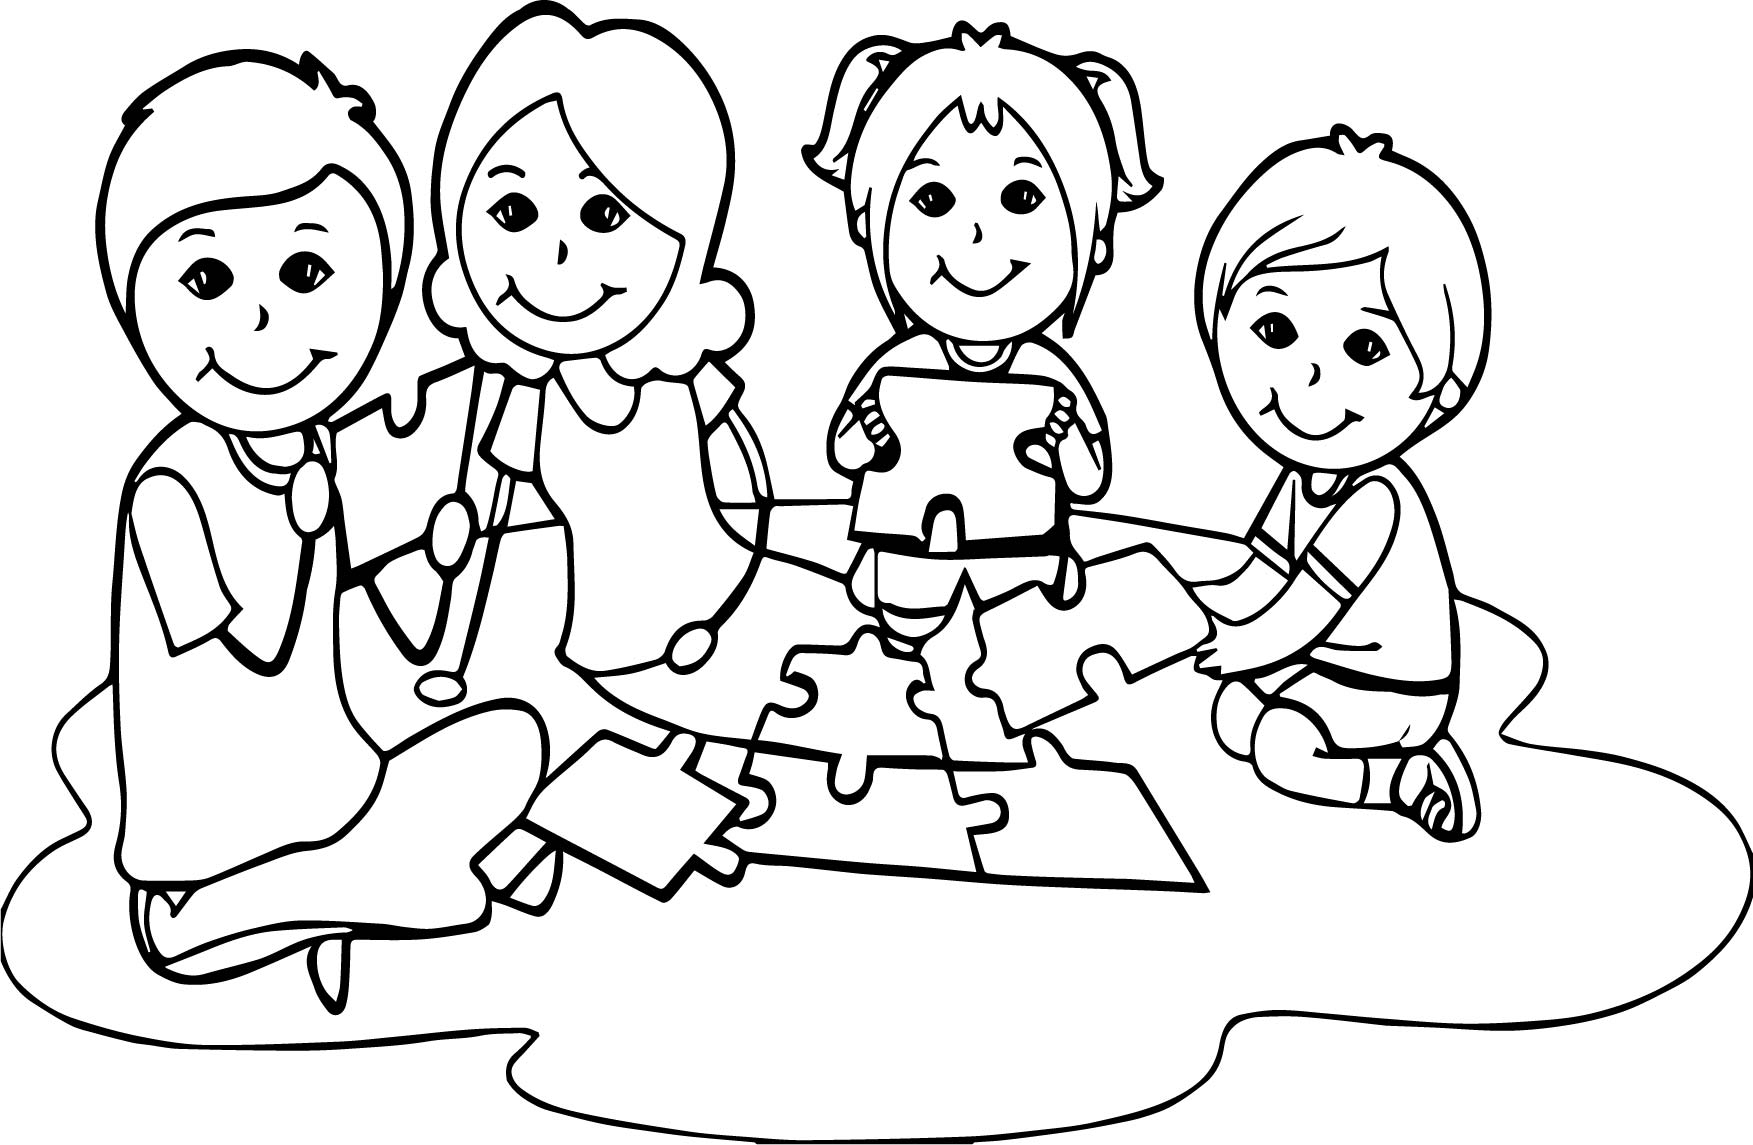 Board Children Puzzle Coloring Page Wecoloringpage Com